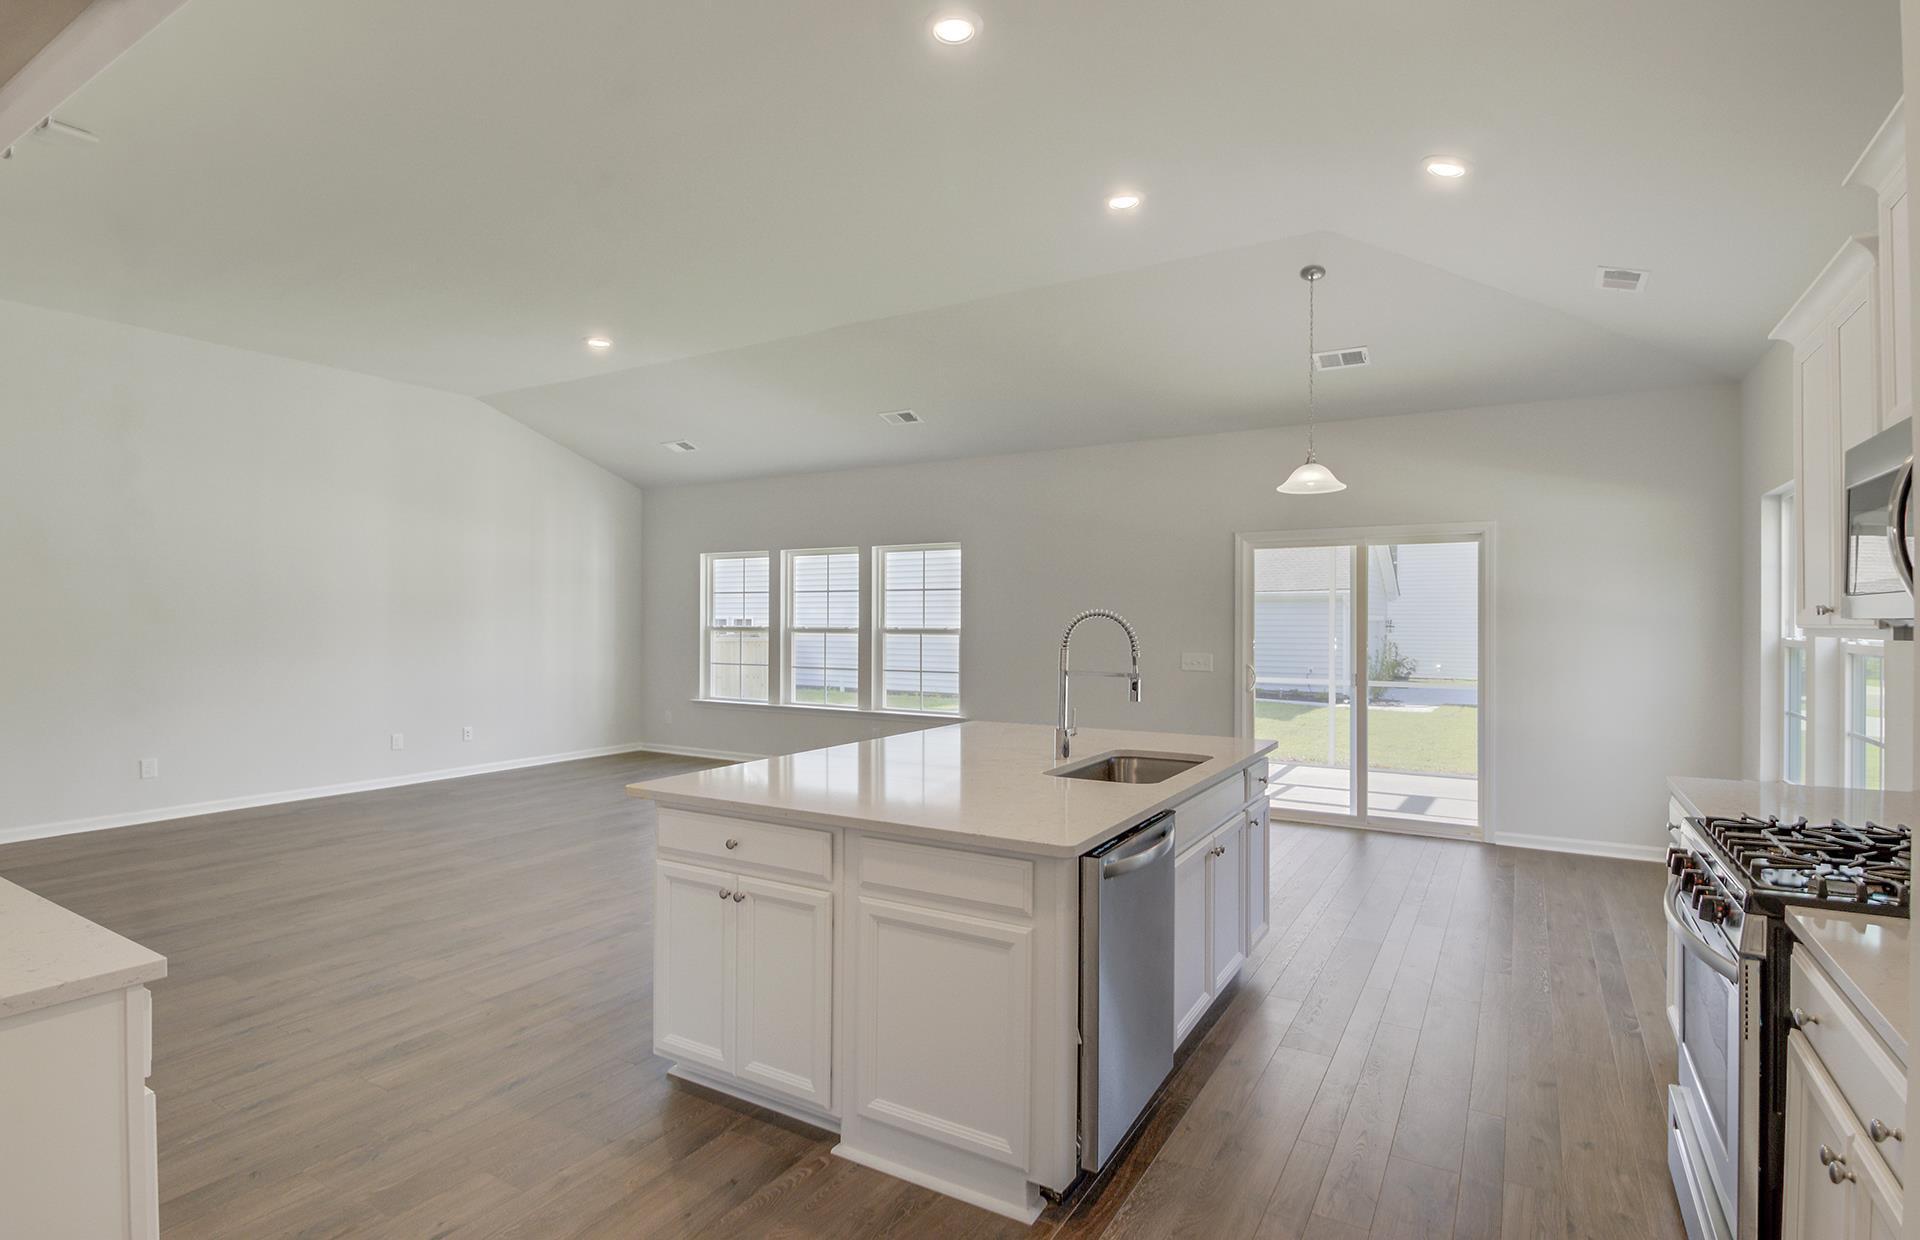 Cane Bay Plantation Homes For Sale - 205 Granton Edge, Summerville, SC - 16